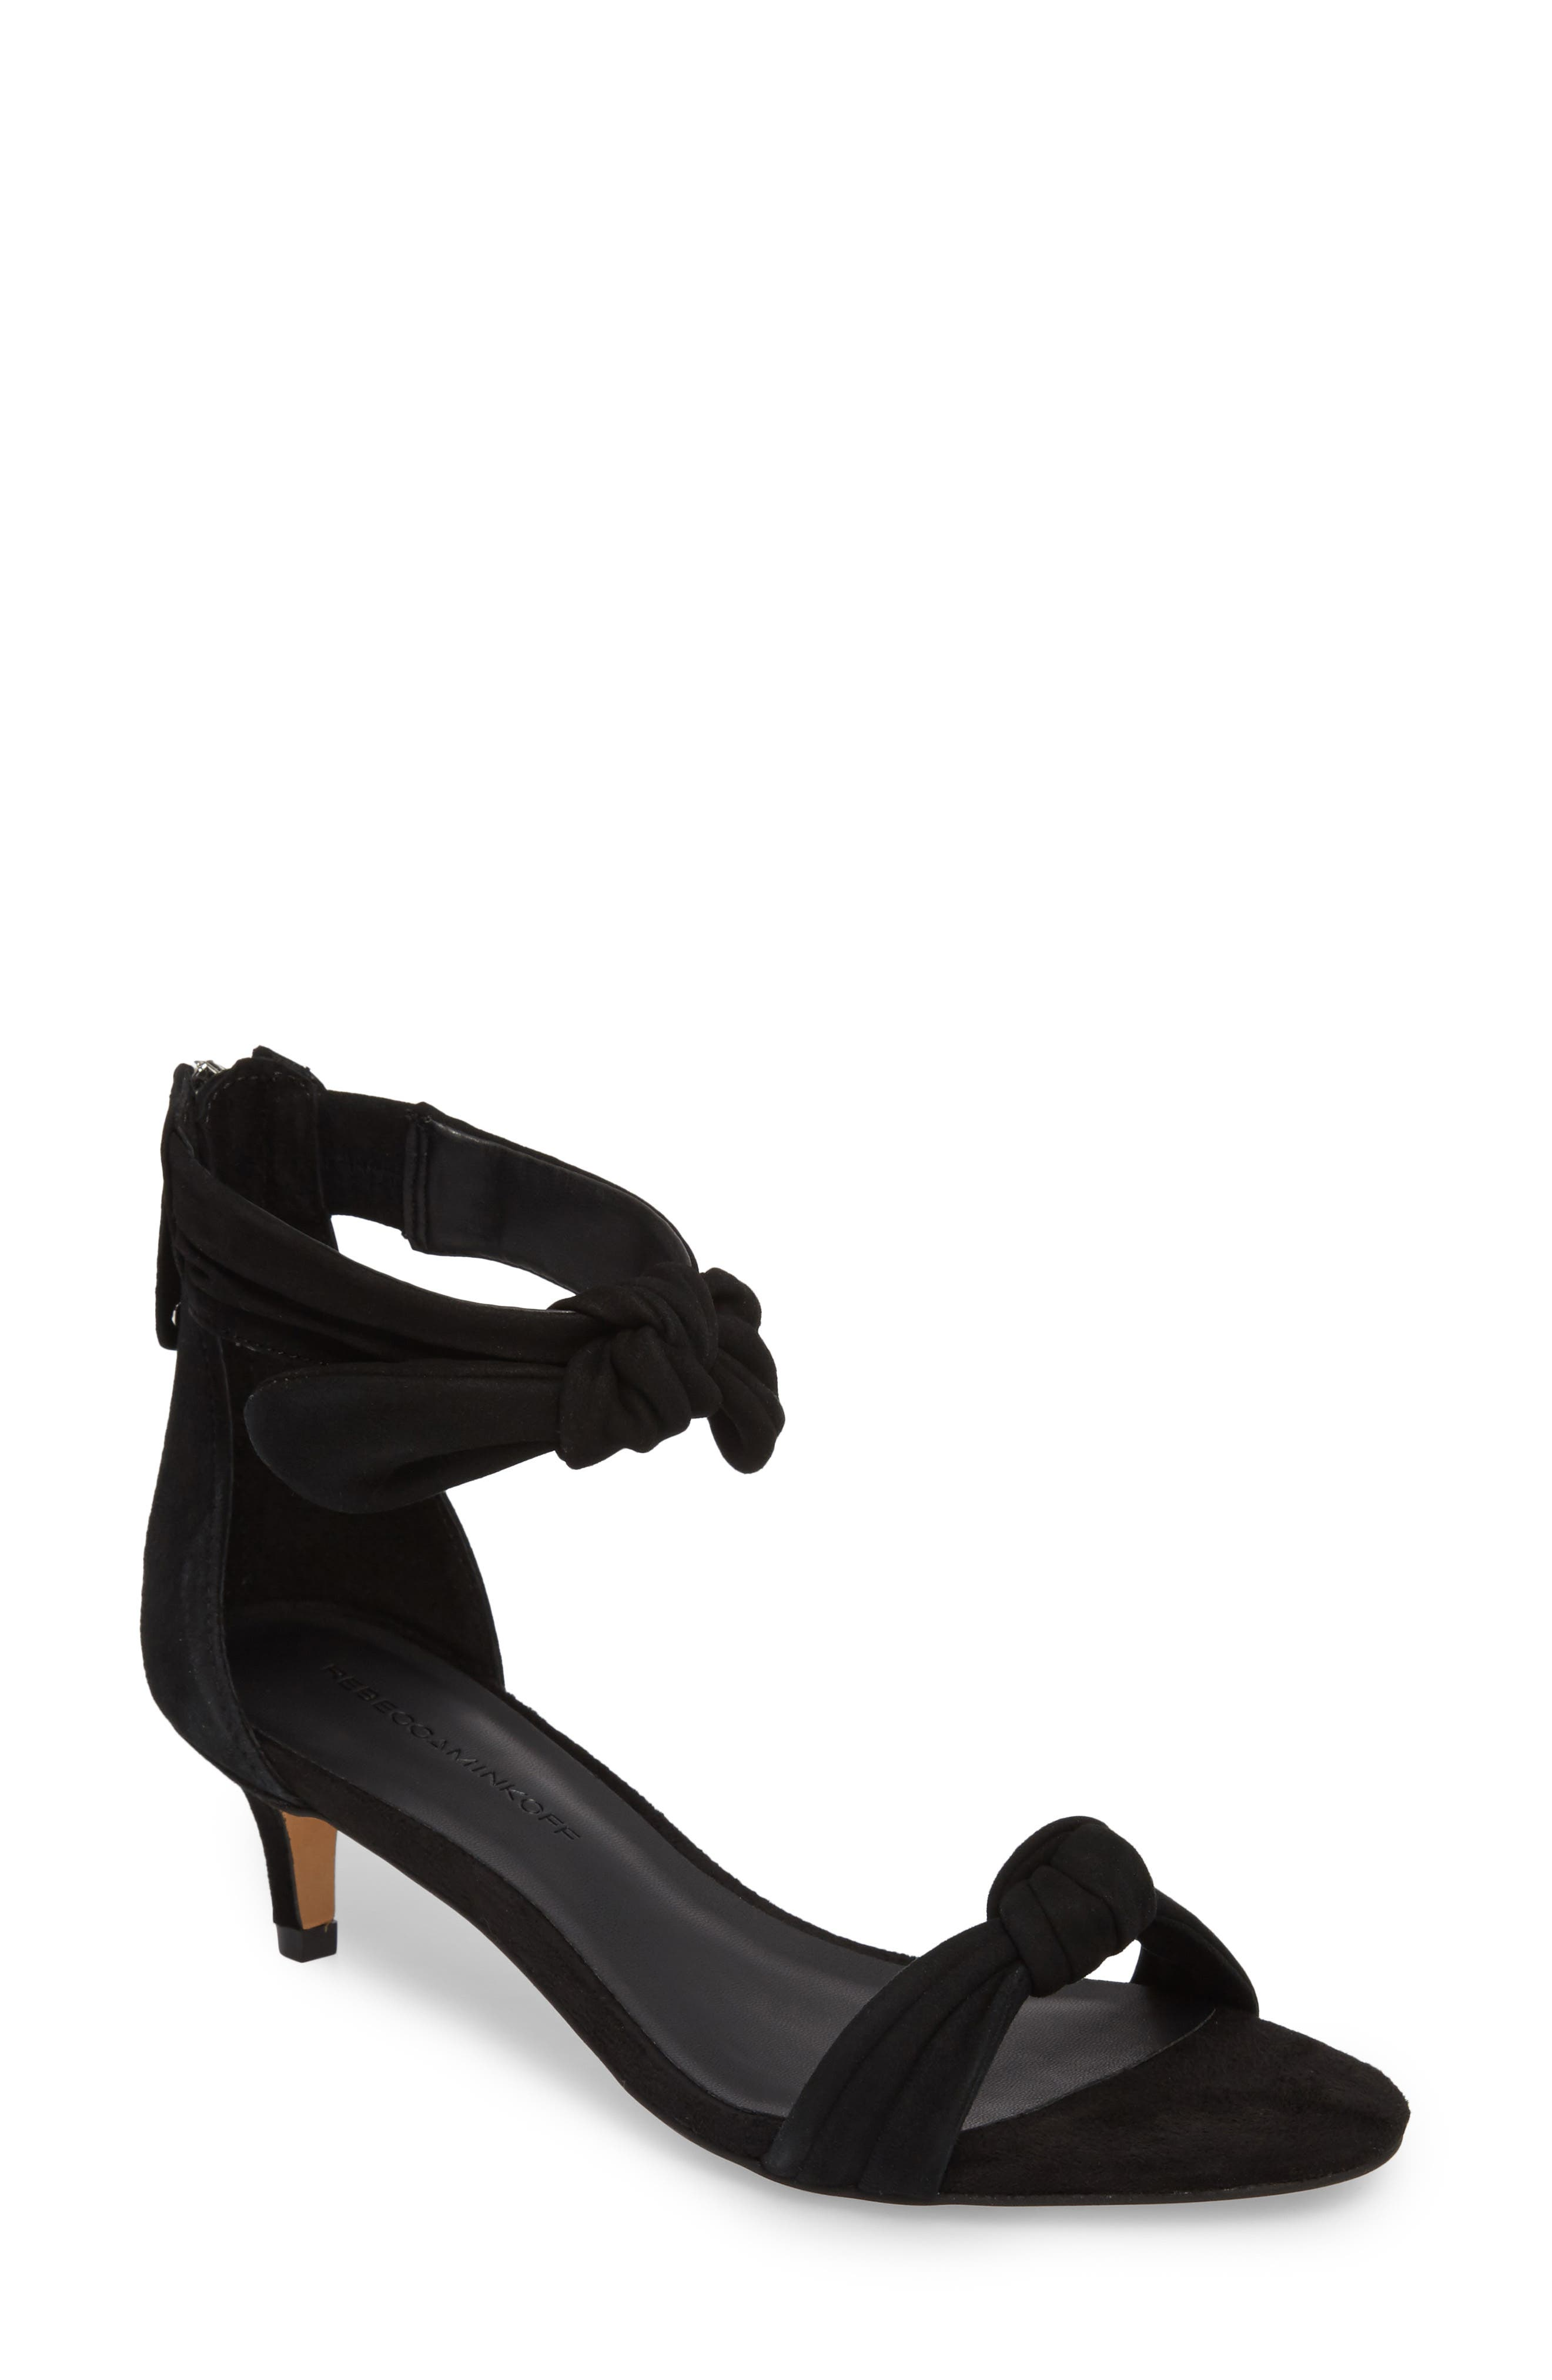 Alternate Image 1 Selected - Rebecca Minkoff Kaley Knotted Kitten Heel Sandal (Women)